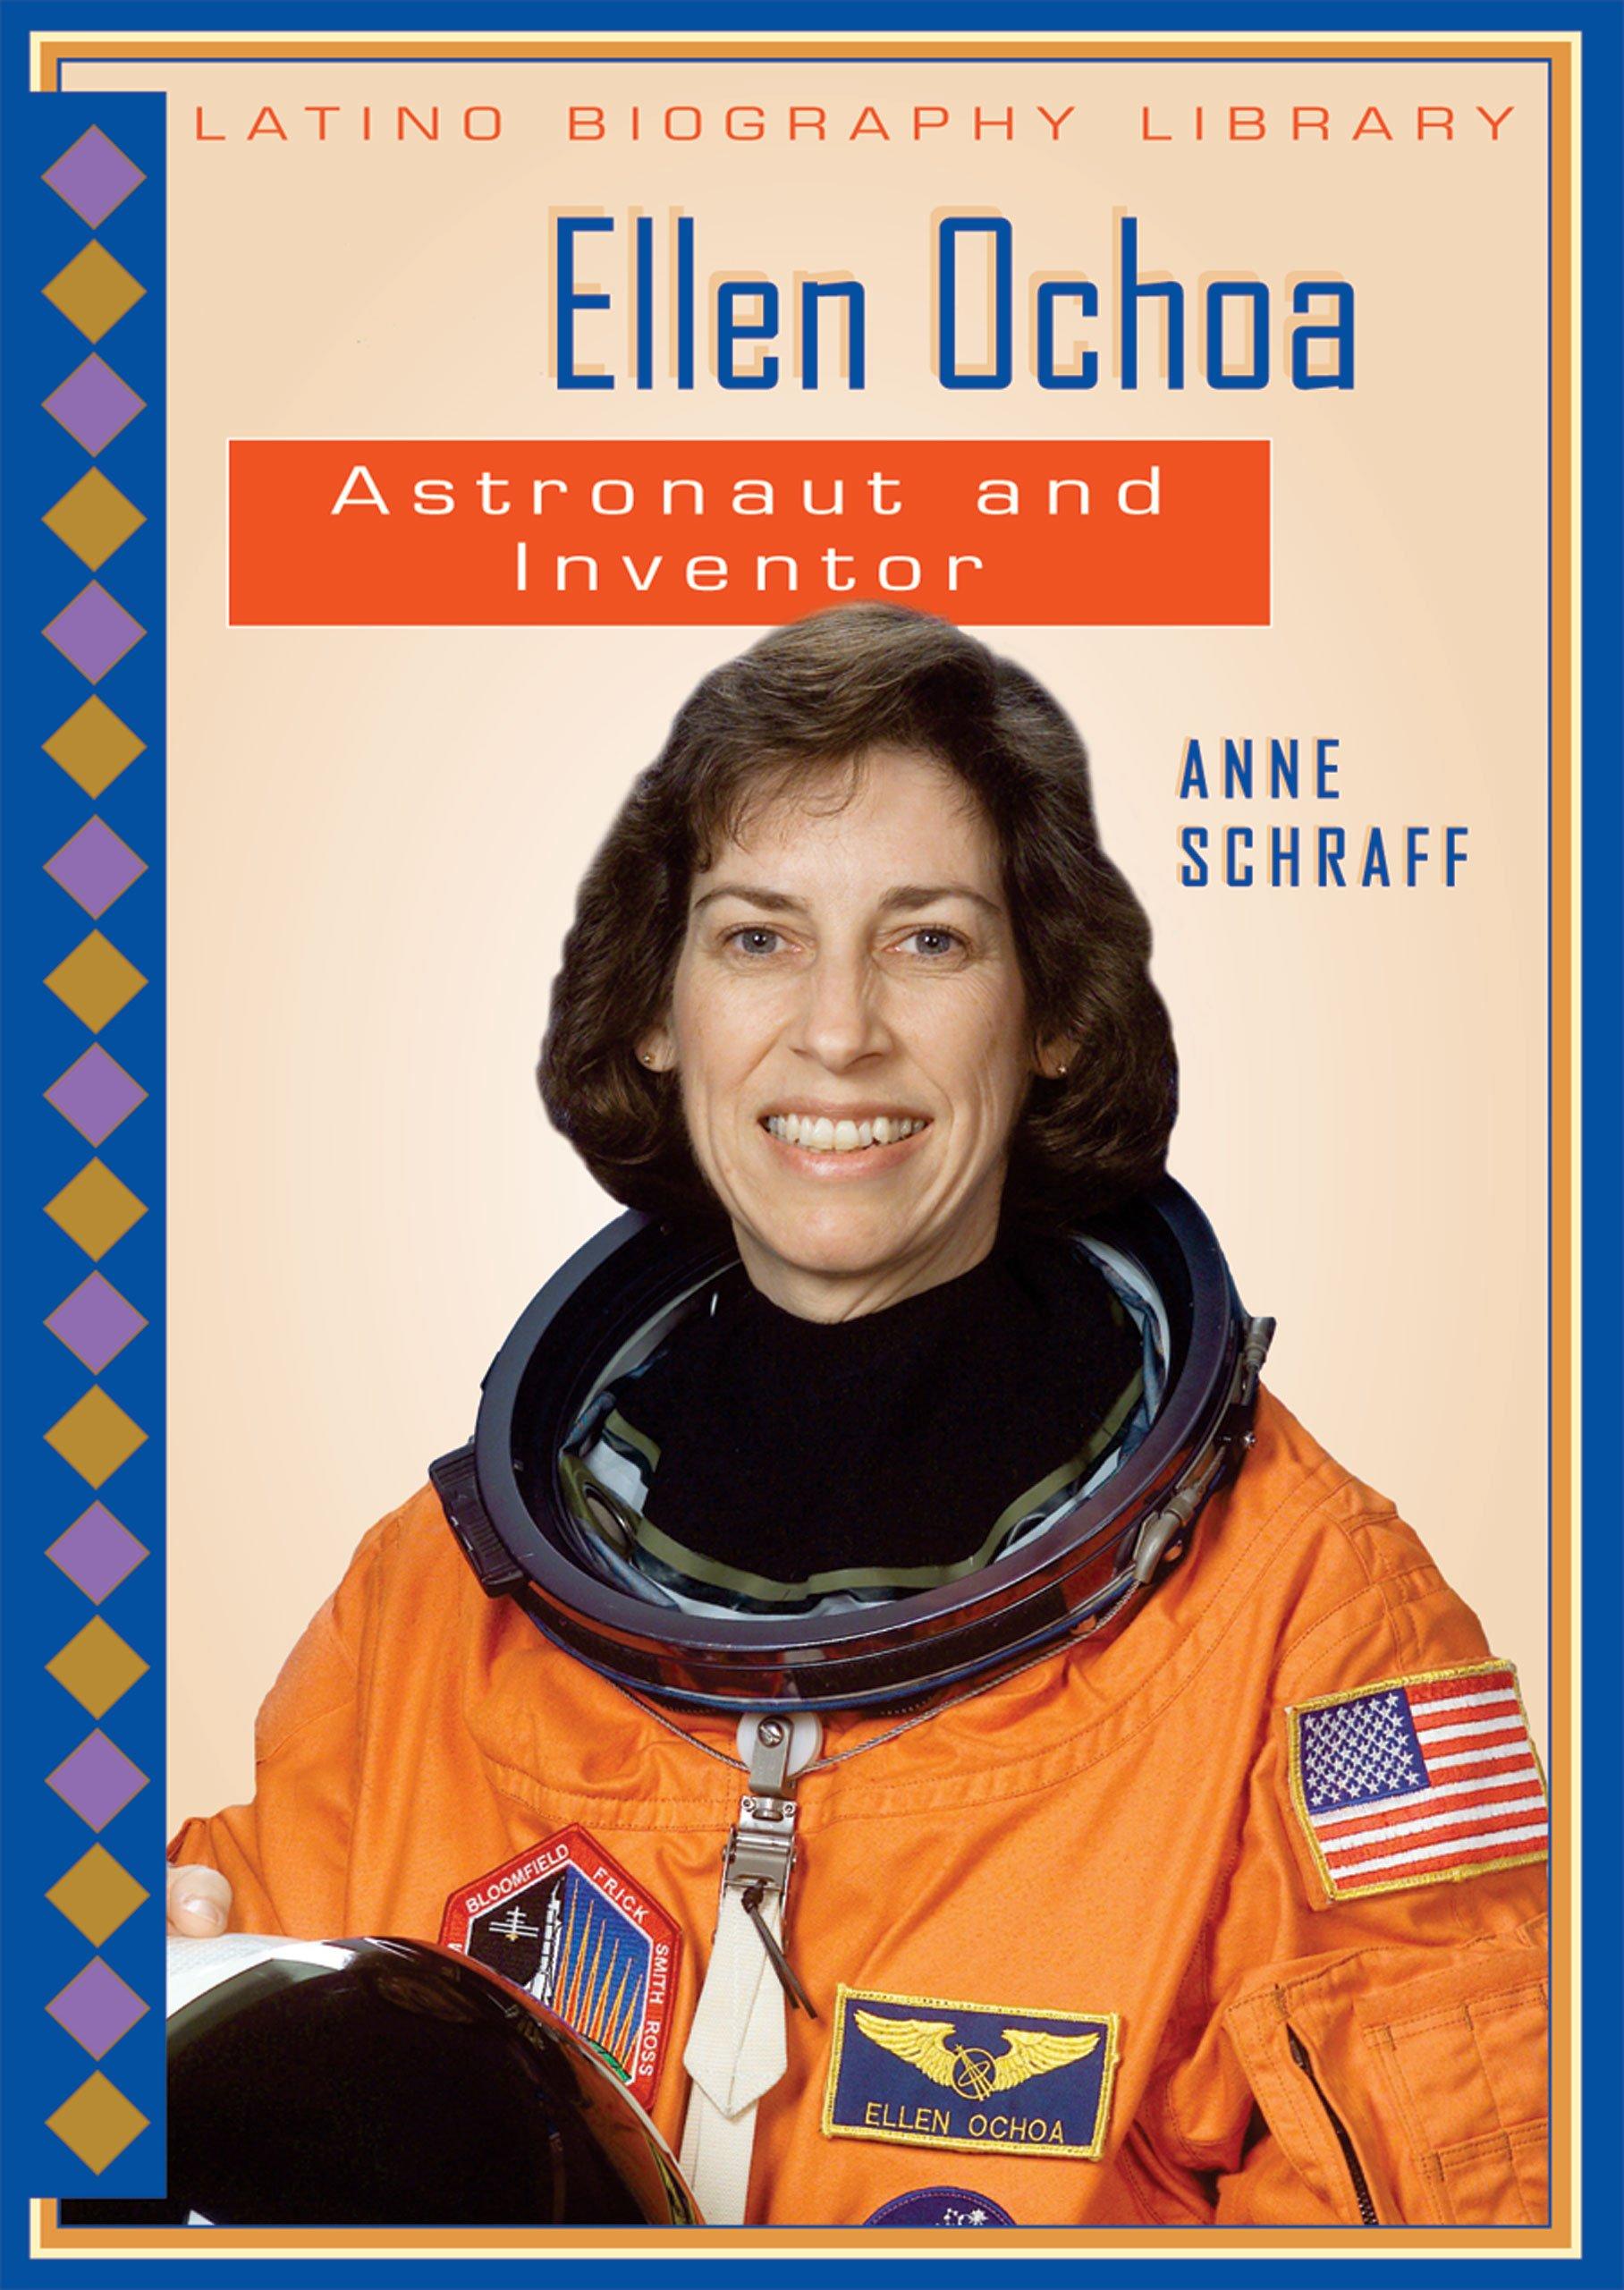 Amazon.com: Ellen Ochoa: Astronaut and Inventor (Latino Biography ...